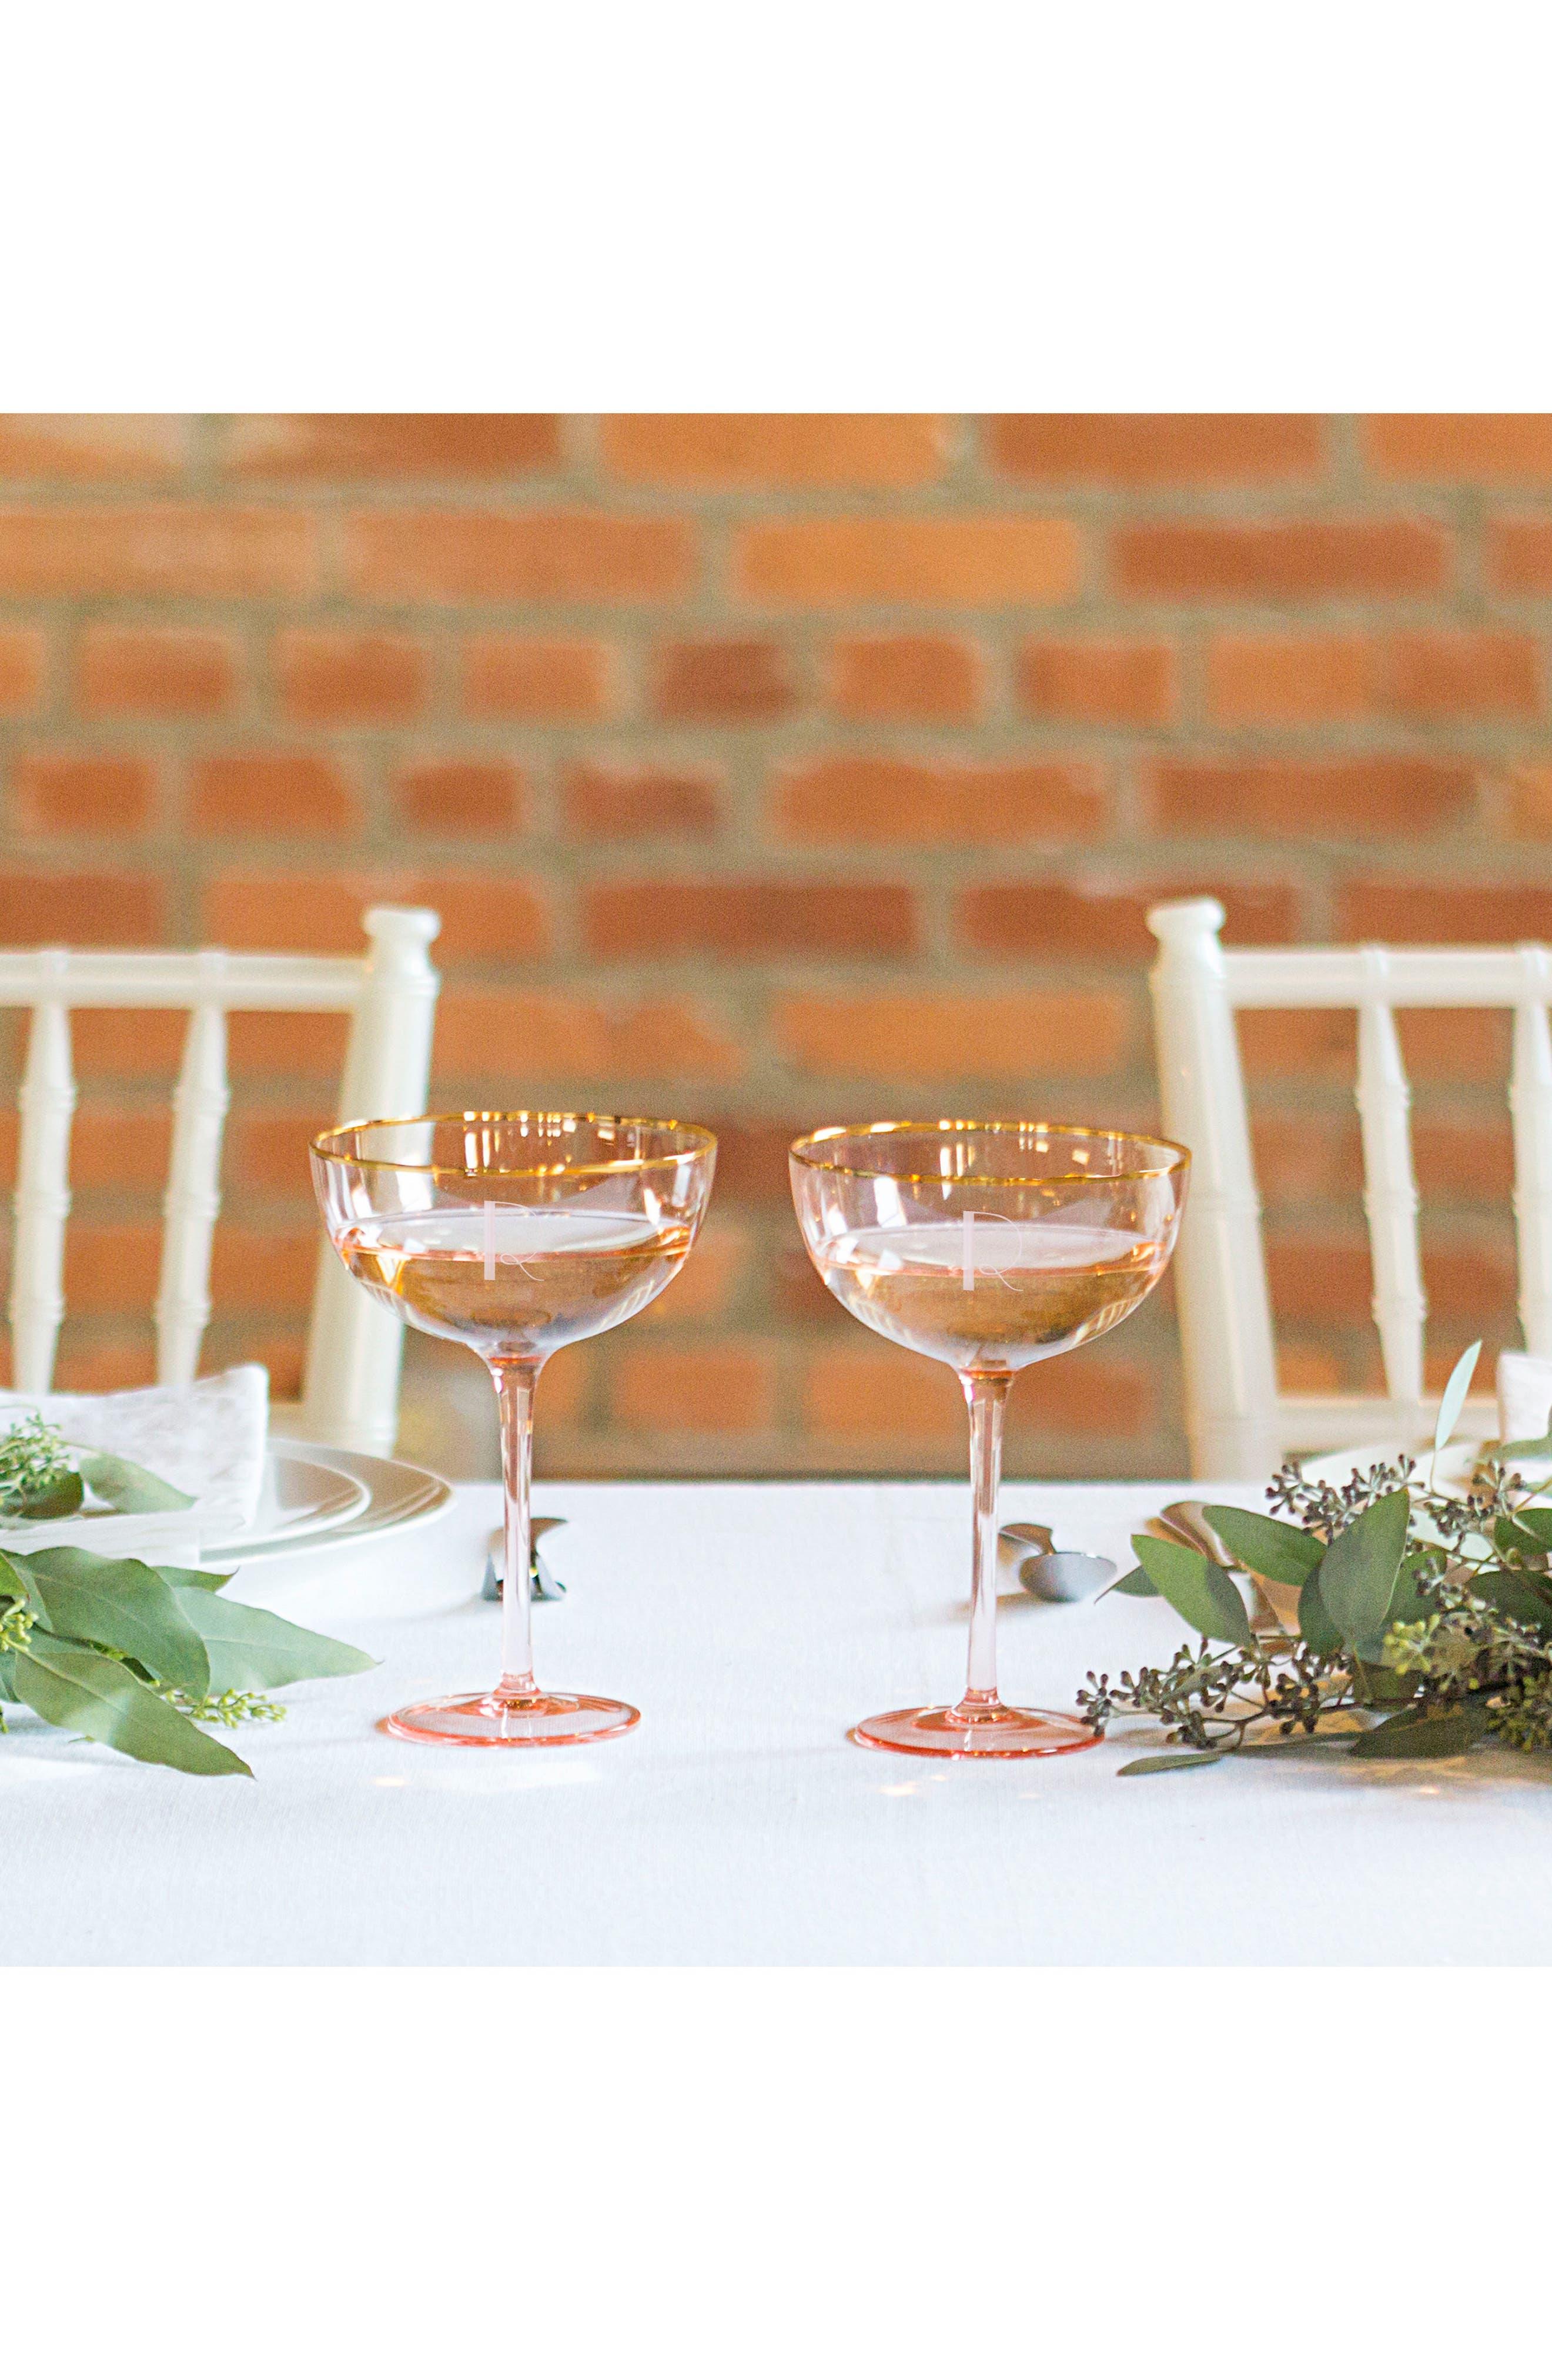 Monogram Set of 2 Champagne Coupes,                             Alternate thumbnail 2, color,                             Blush